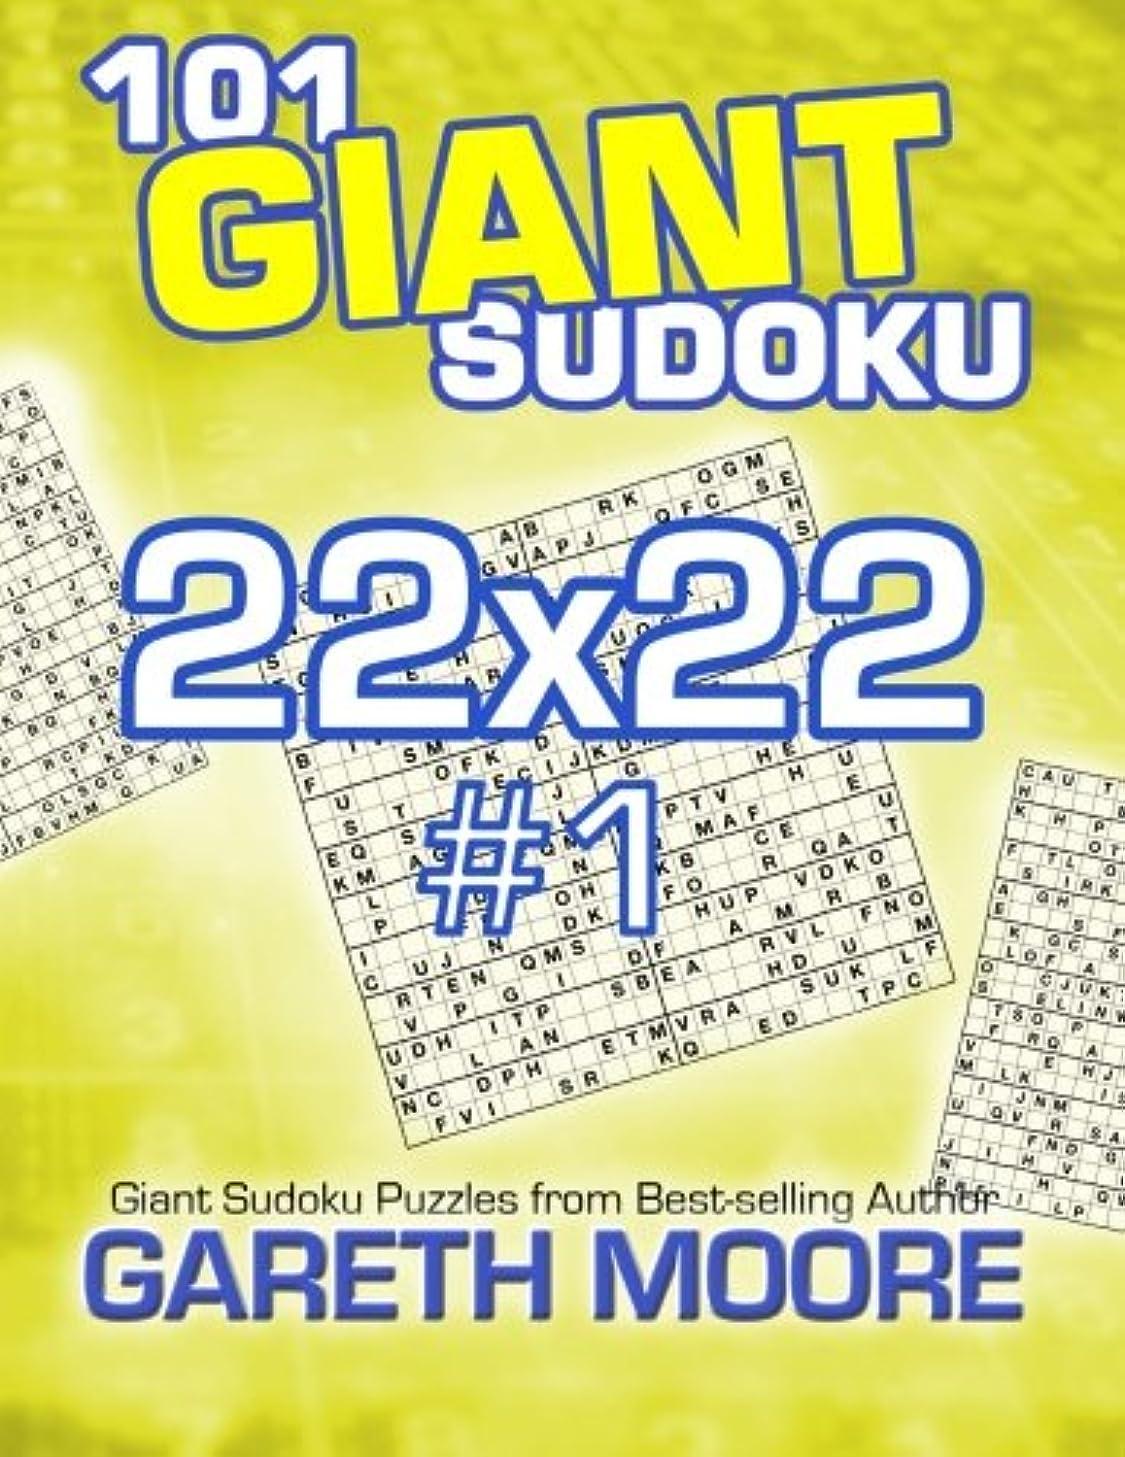 101 Giant Sudoku 22x22 #1